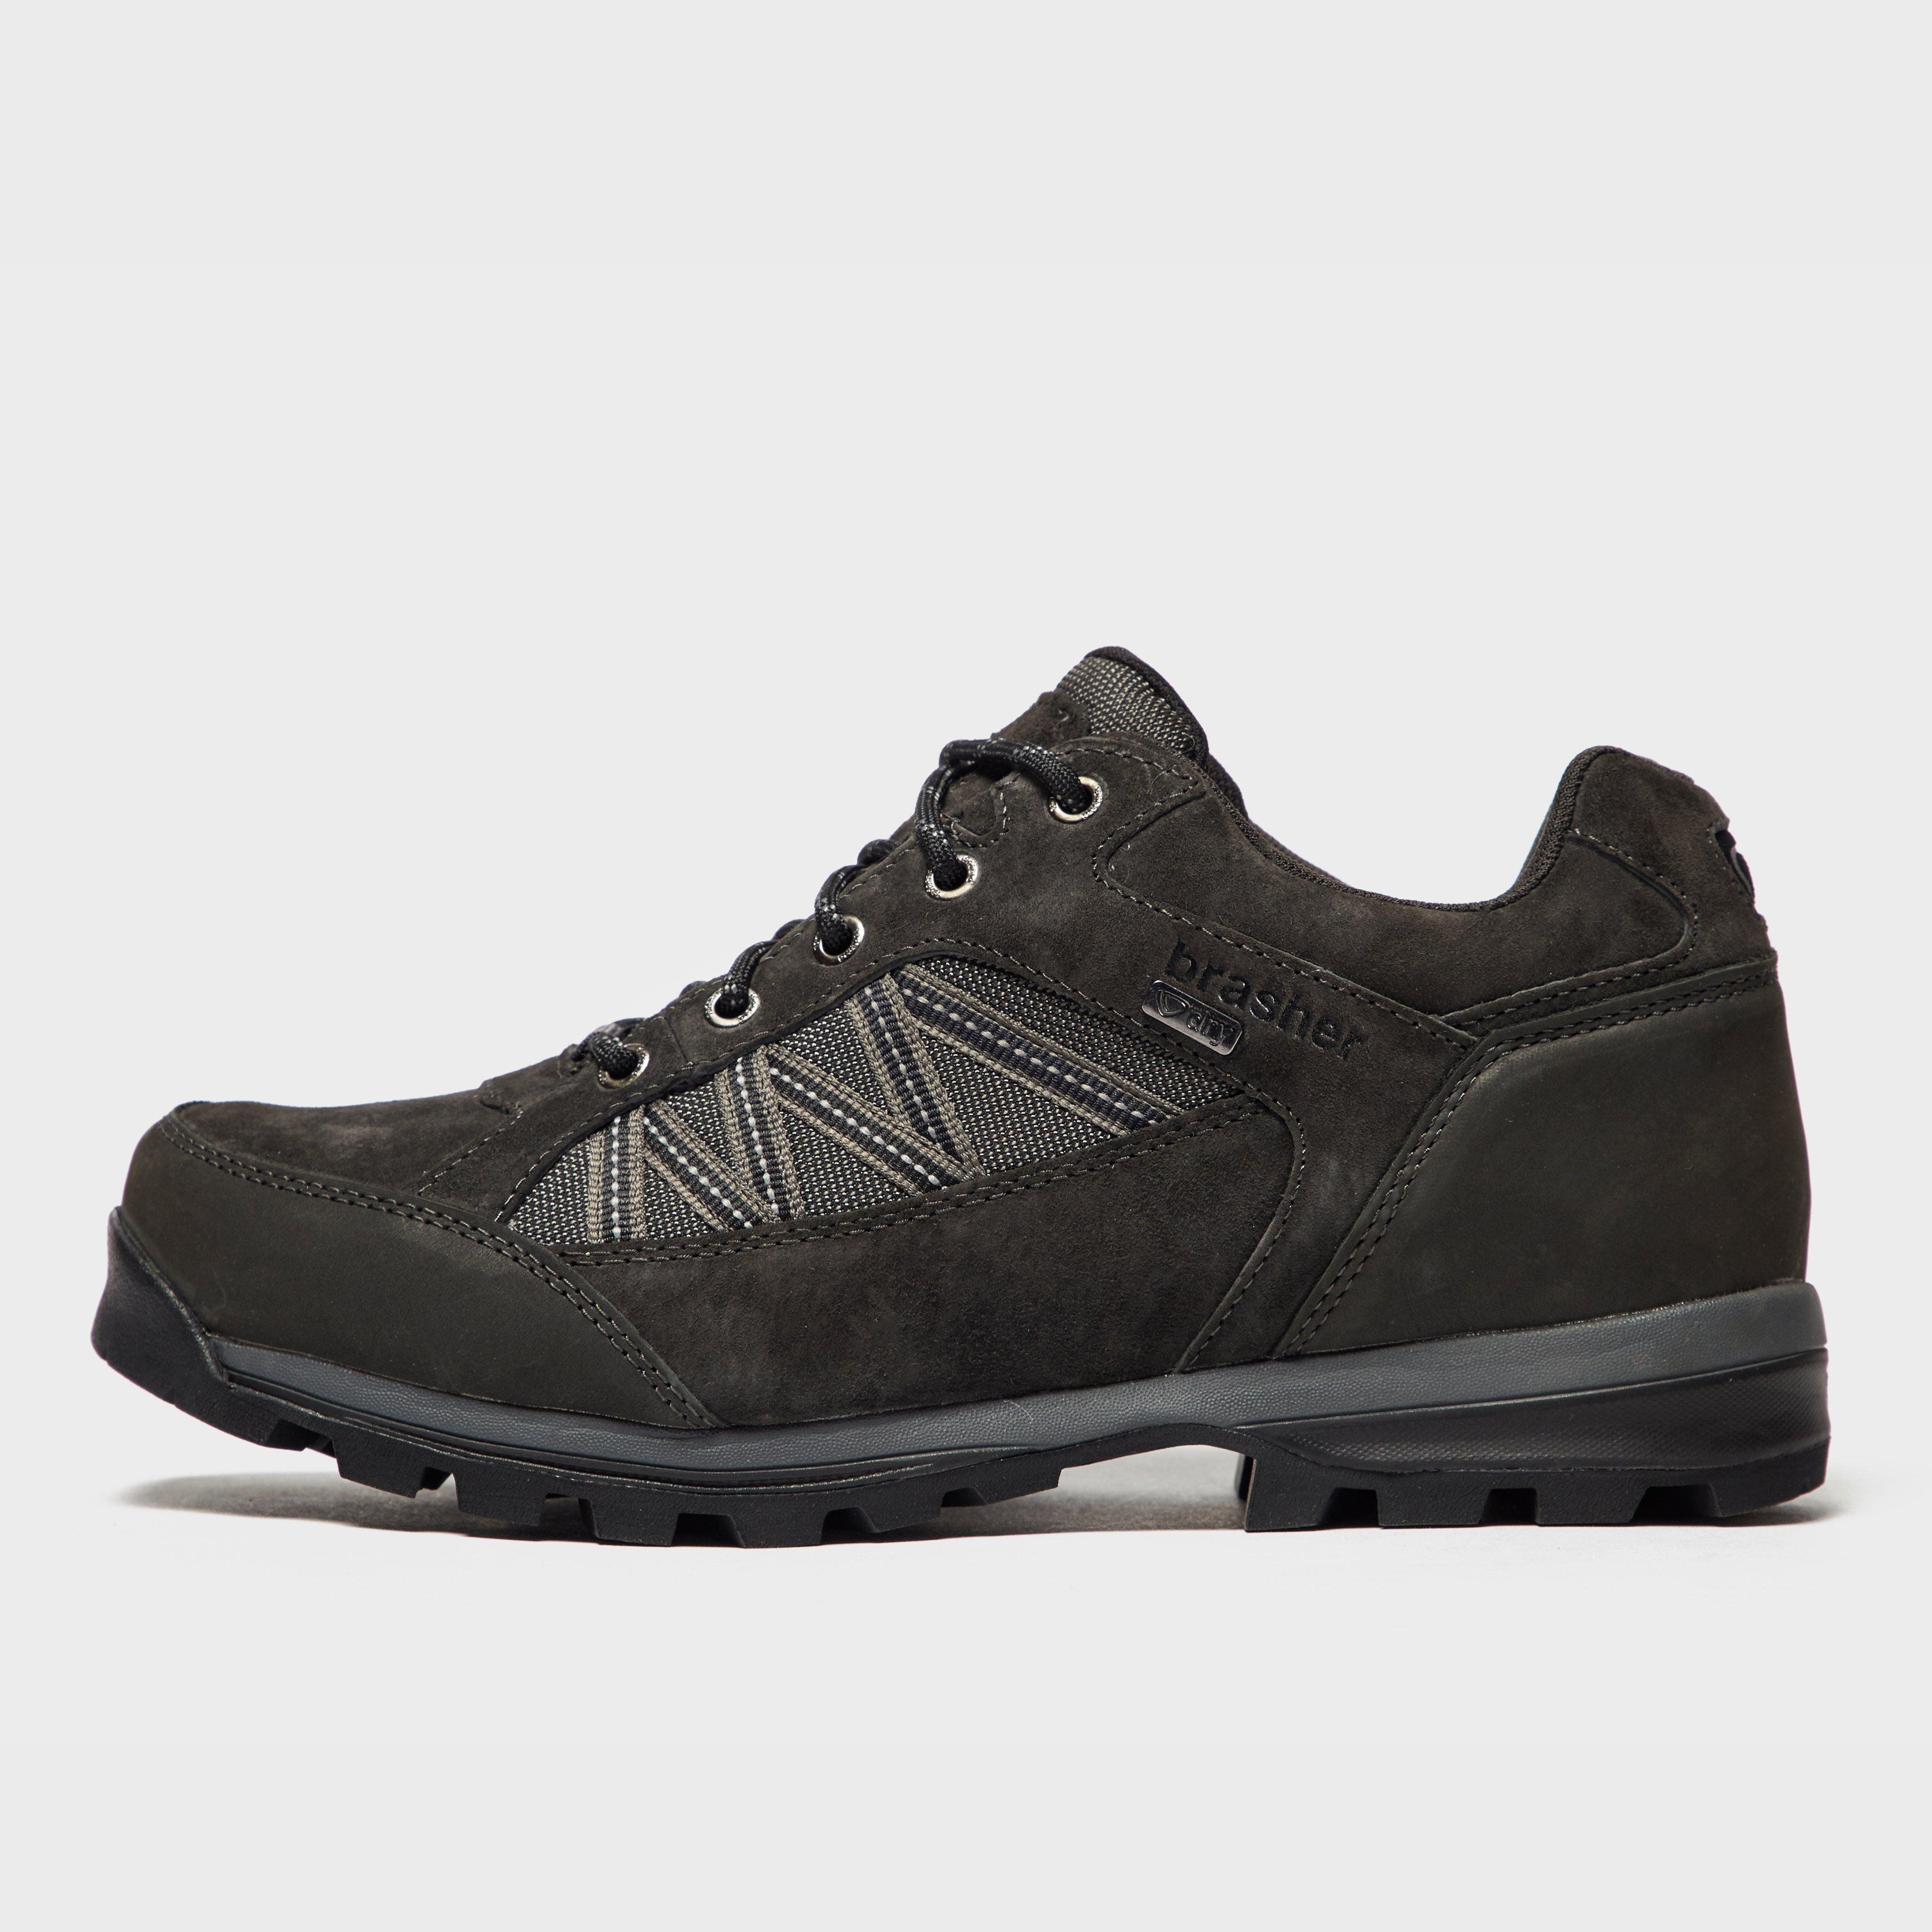 BRASHER Men's Country Hiker Walking Shoes